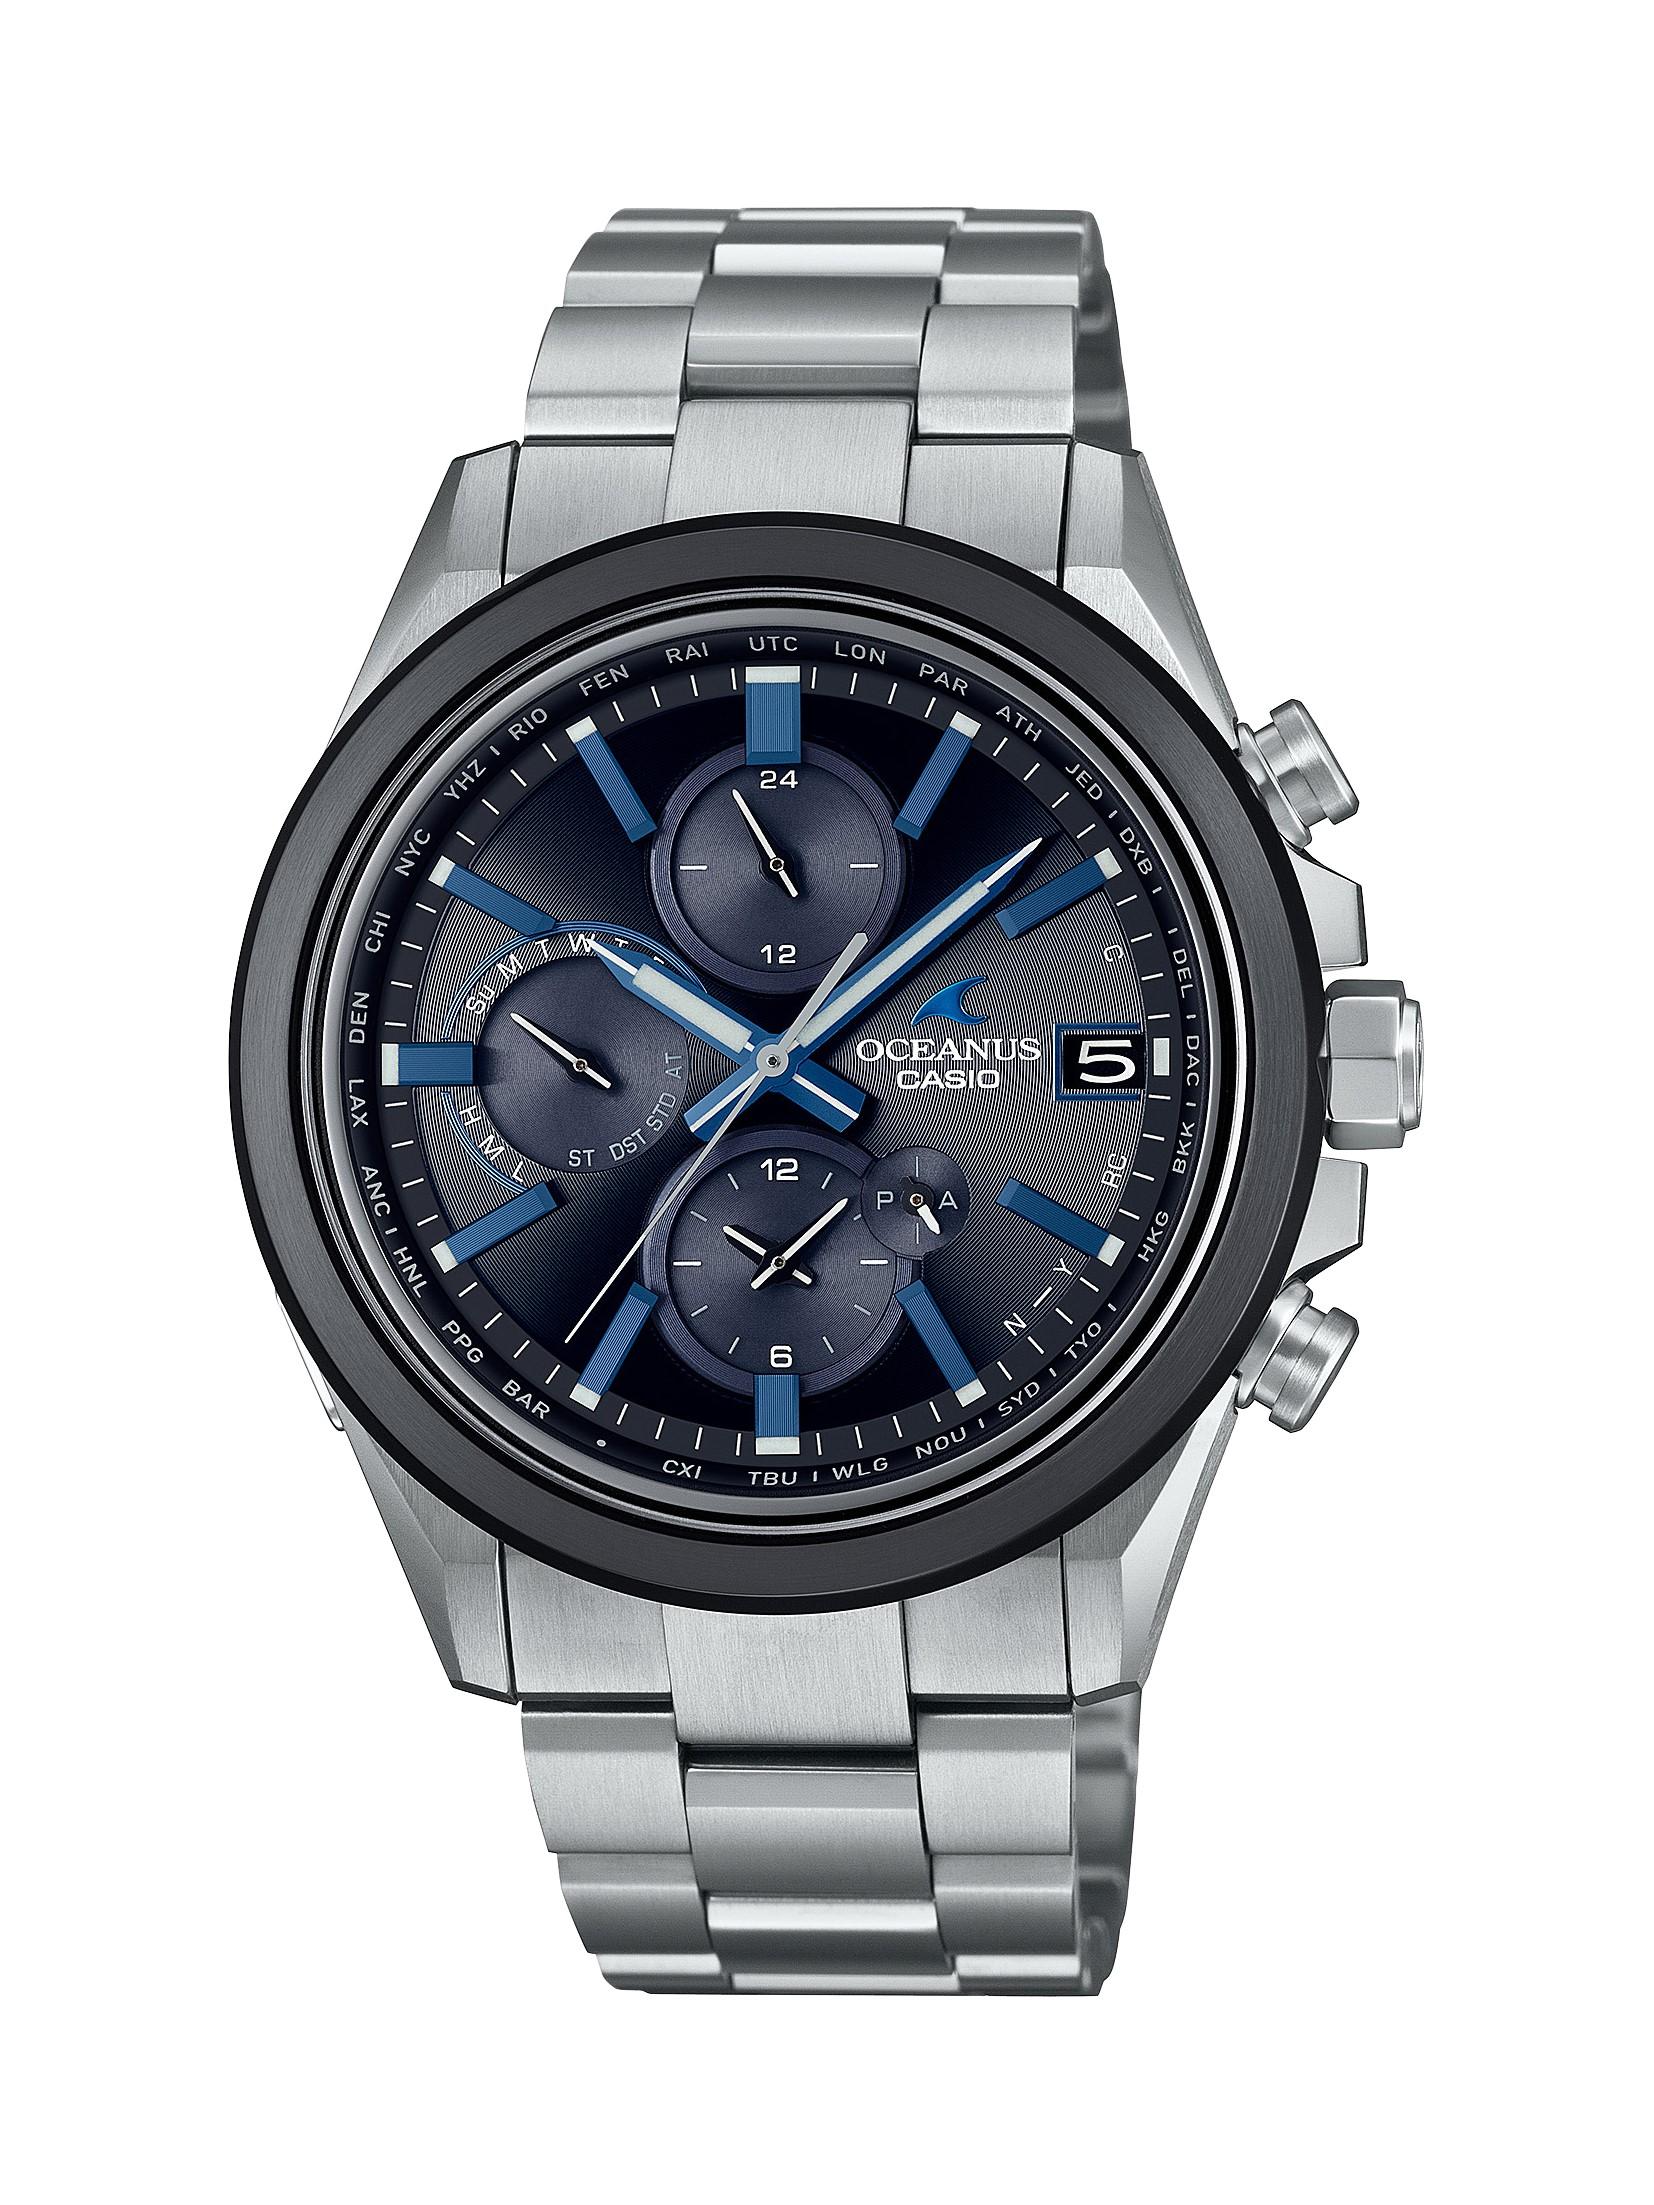 CASIO腕時計 OCEANUS OCW-T4000A-1AJF C-0157